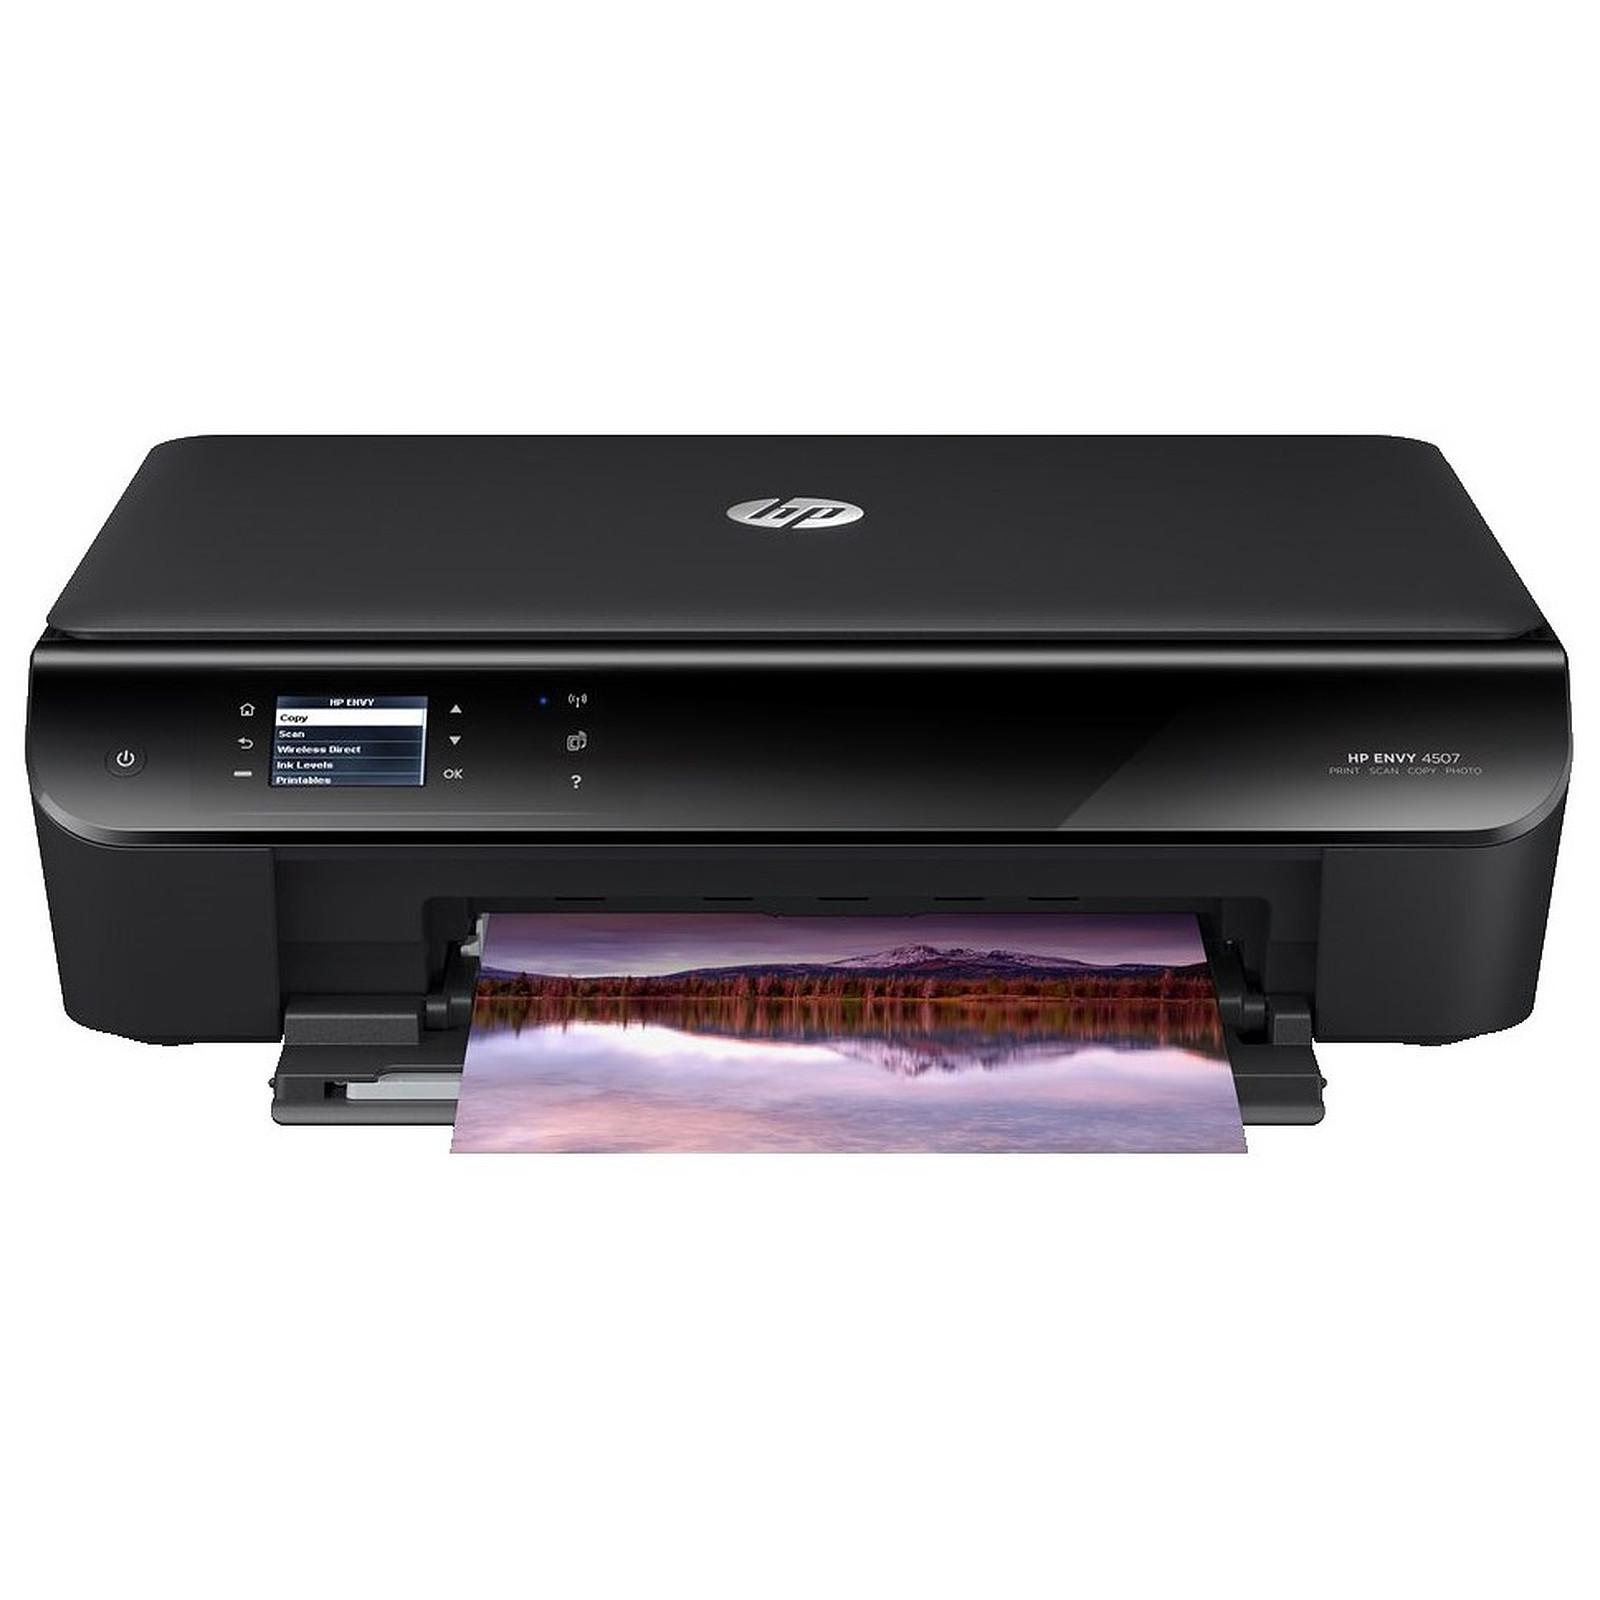 HP Envy 4507 All-in-One (E6G70B)